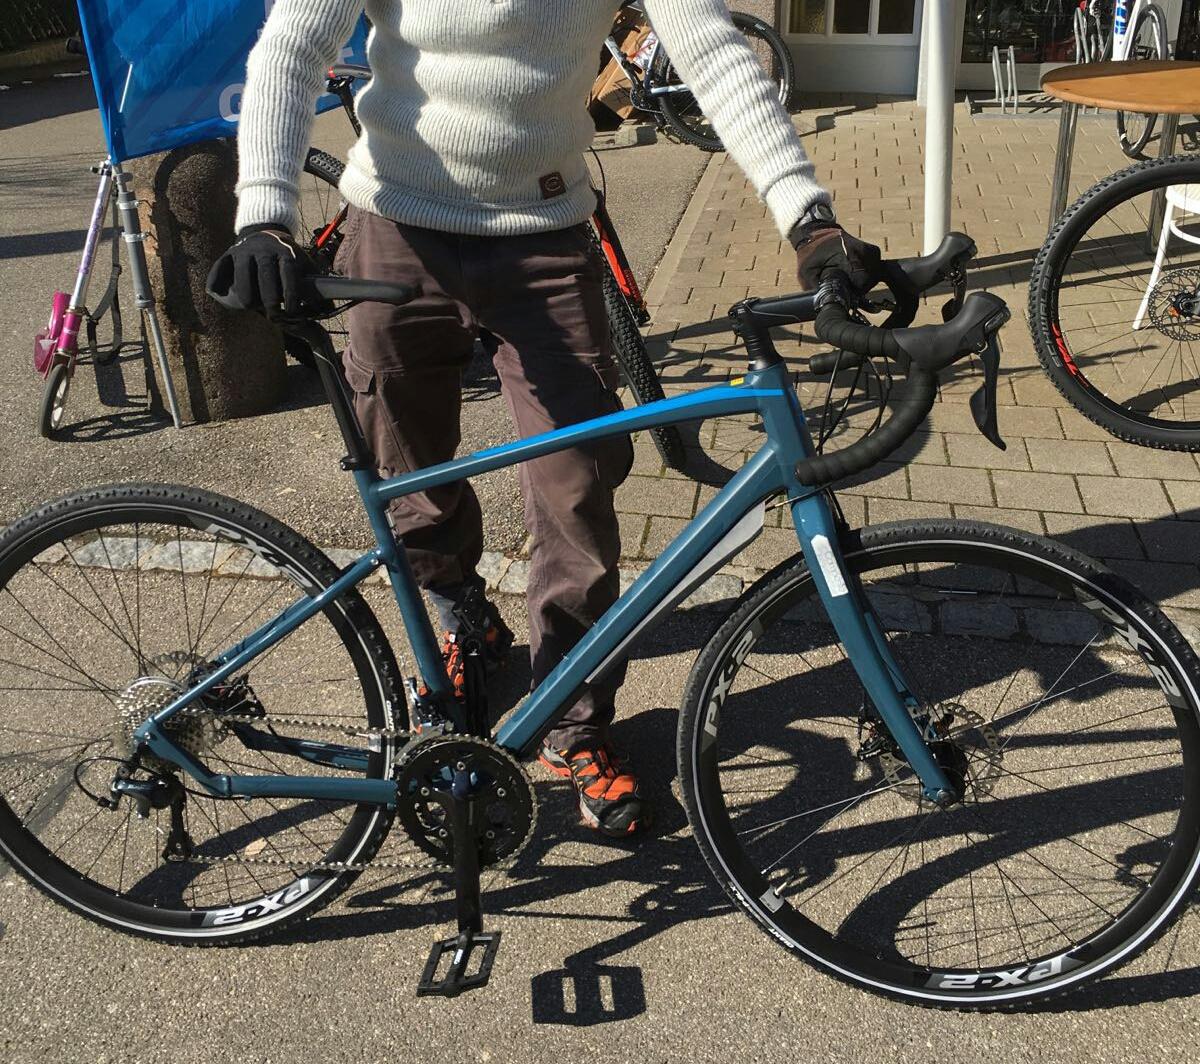 Kona Rove ST Rahmengröße für 180 / 88cm SL ? | Rennrad-News.de